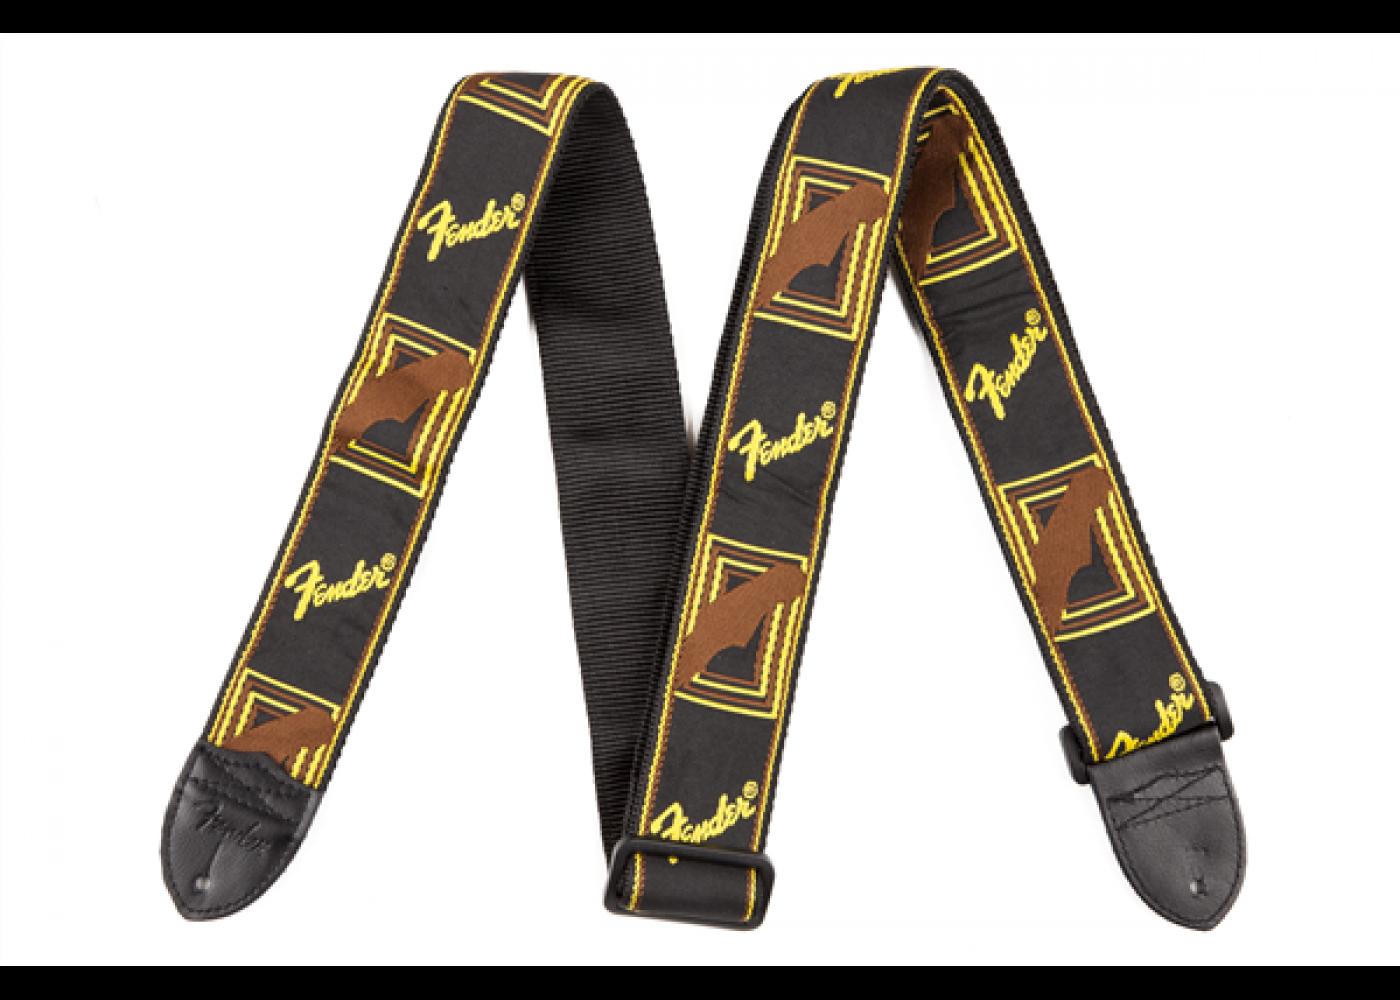 Strap, Fender Running Logo Strap Black and Gold